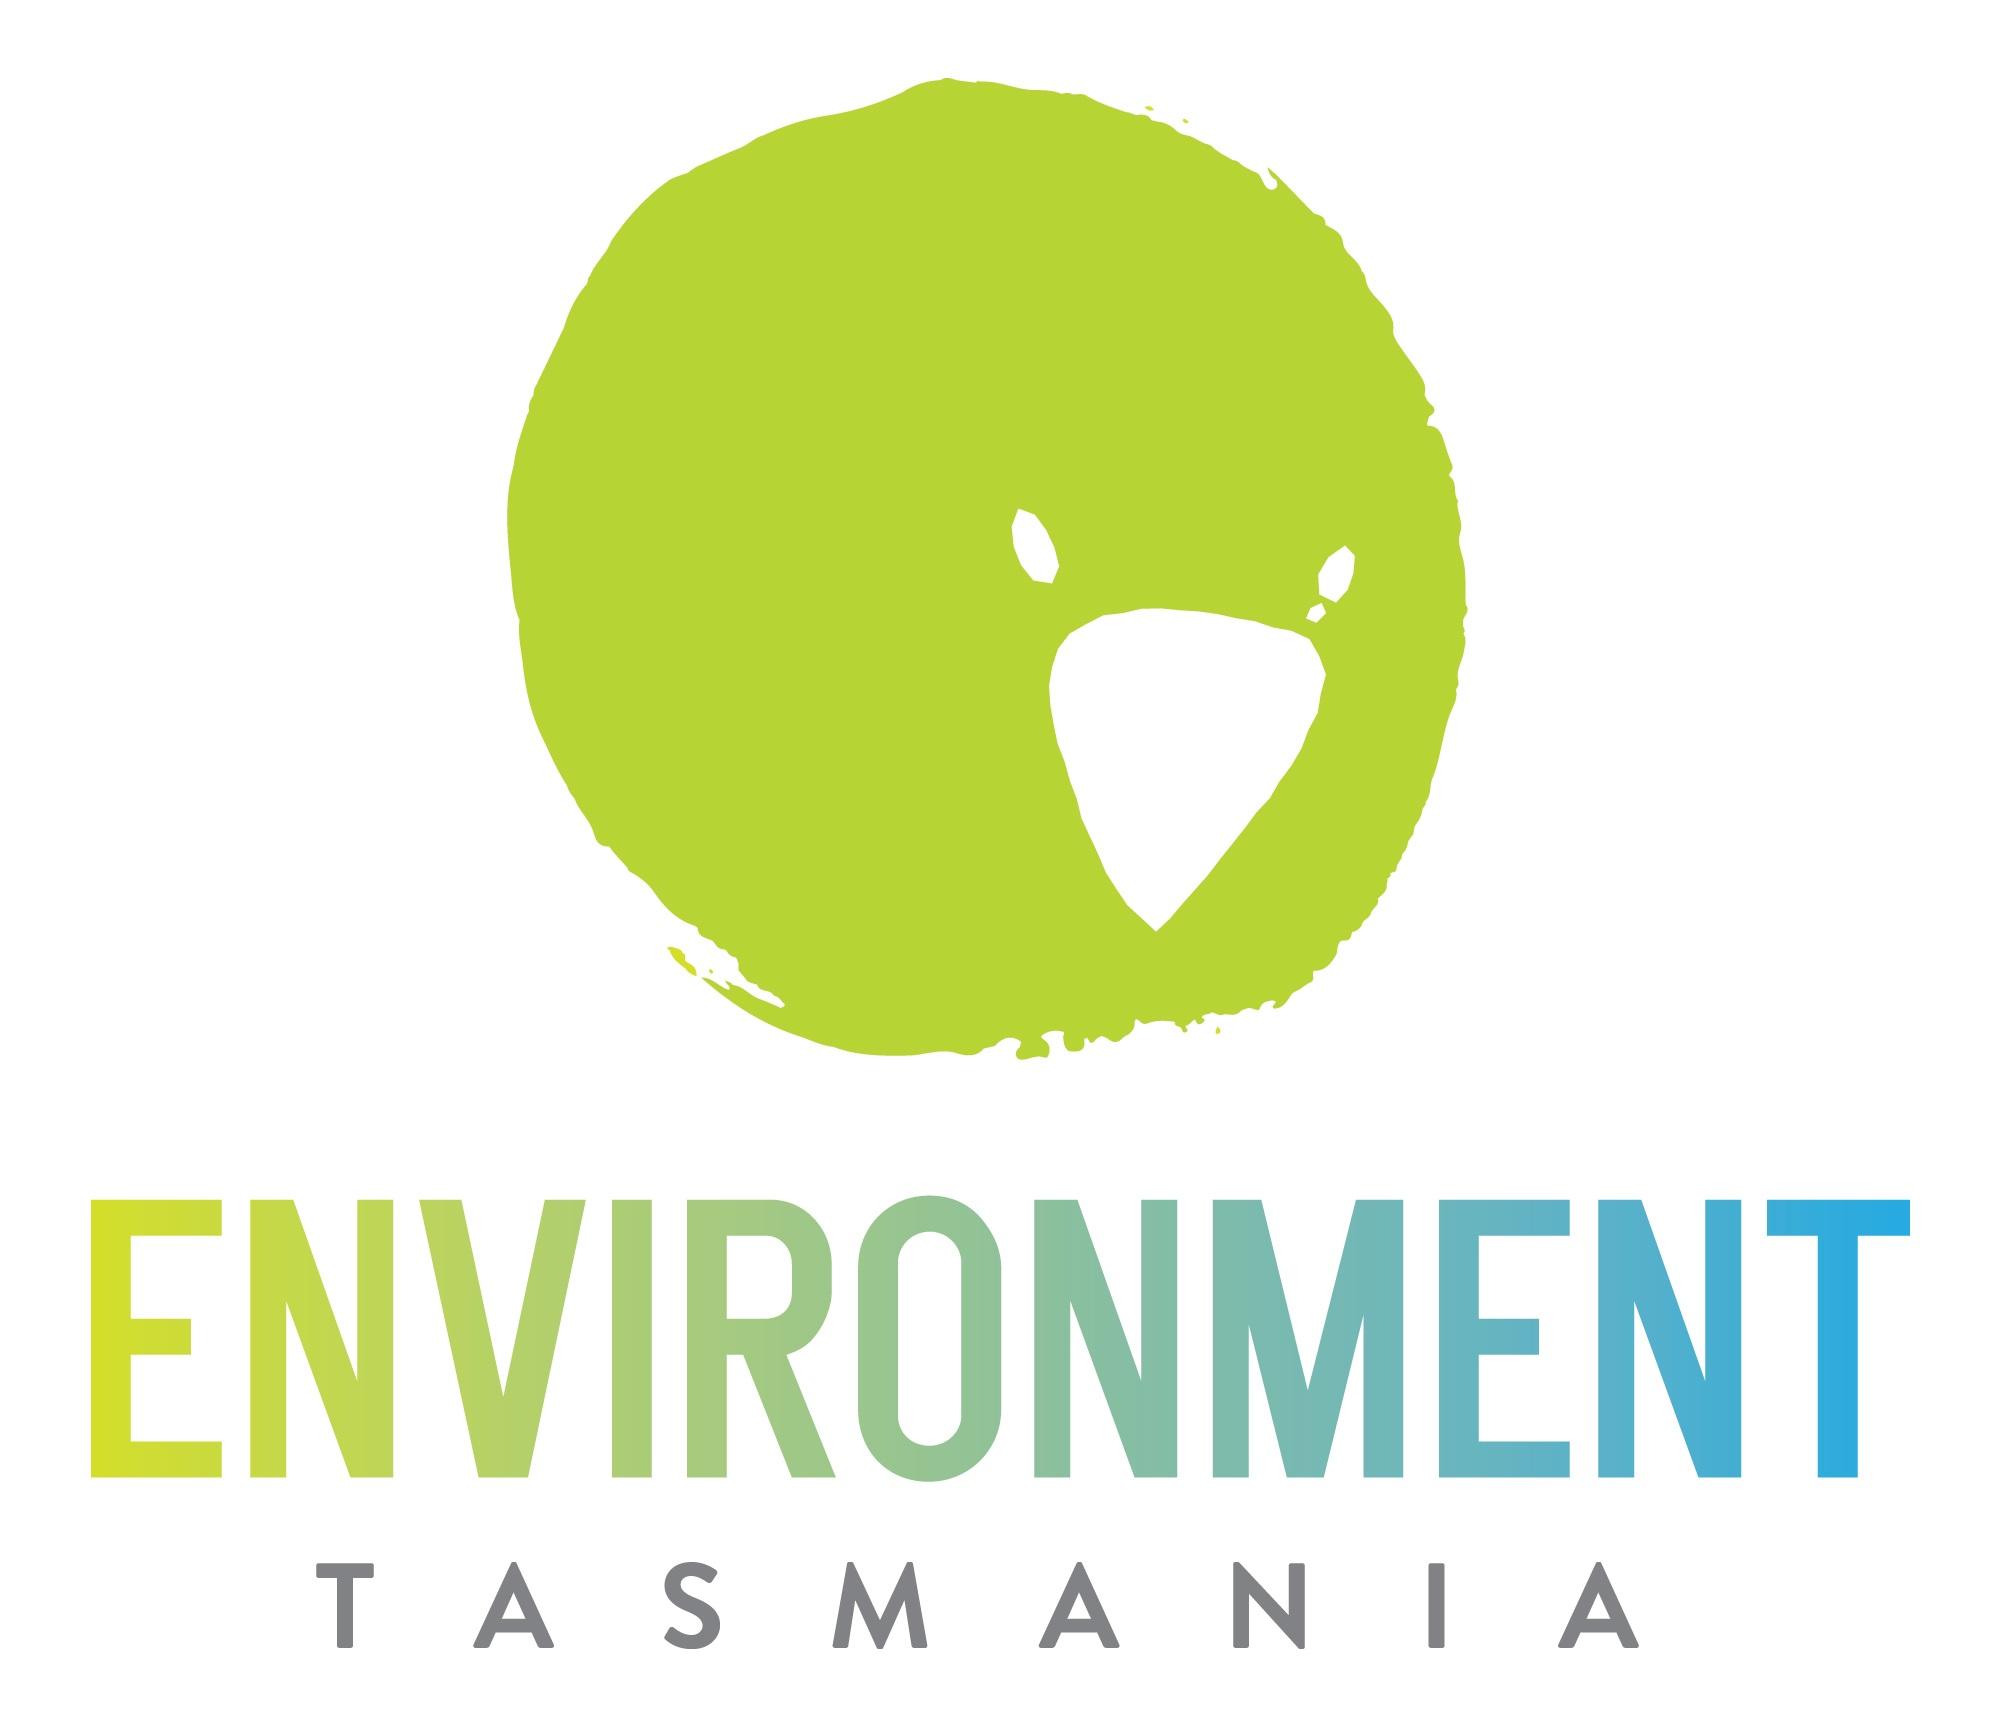 Environment_Tas_Logo_C_(1).jpg